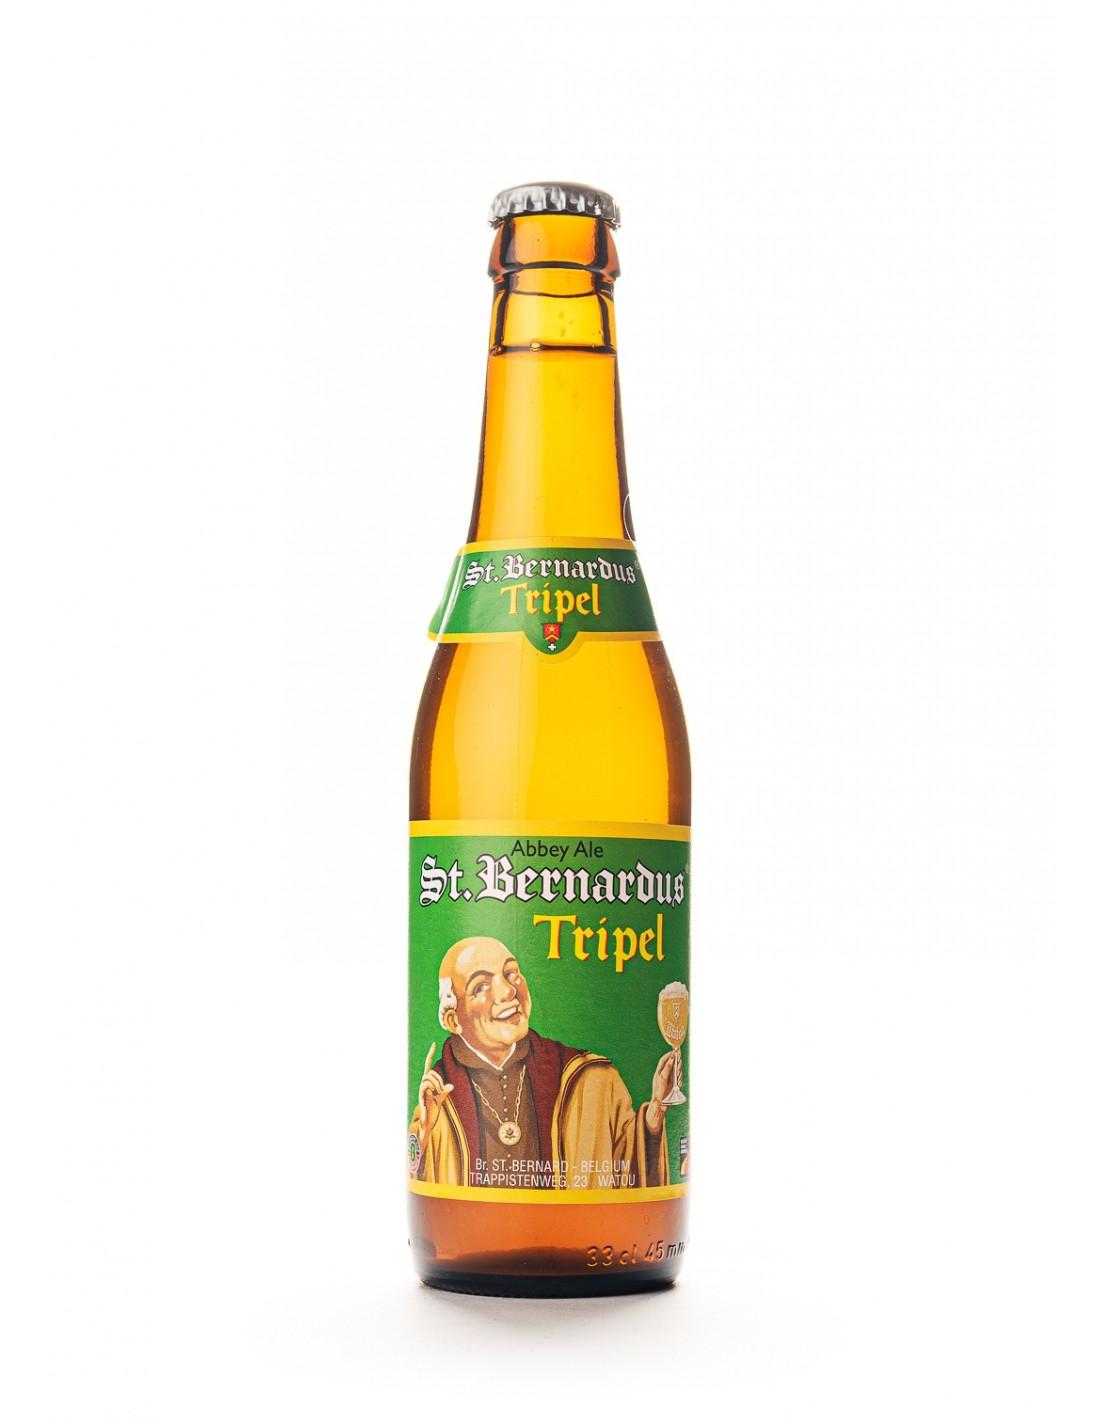 Bere amber, filtrata St.Bernardus, 8% alc., 0.33L, Belgia